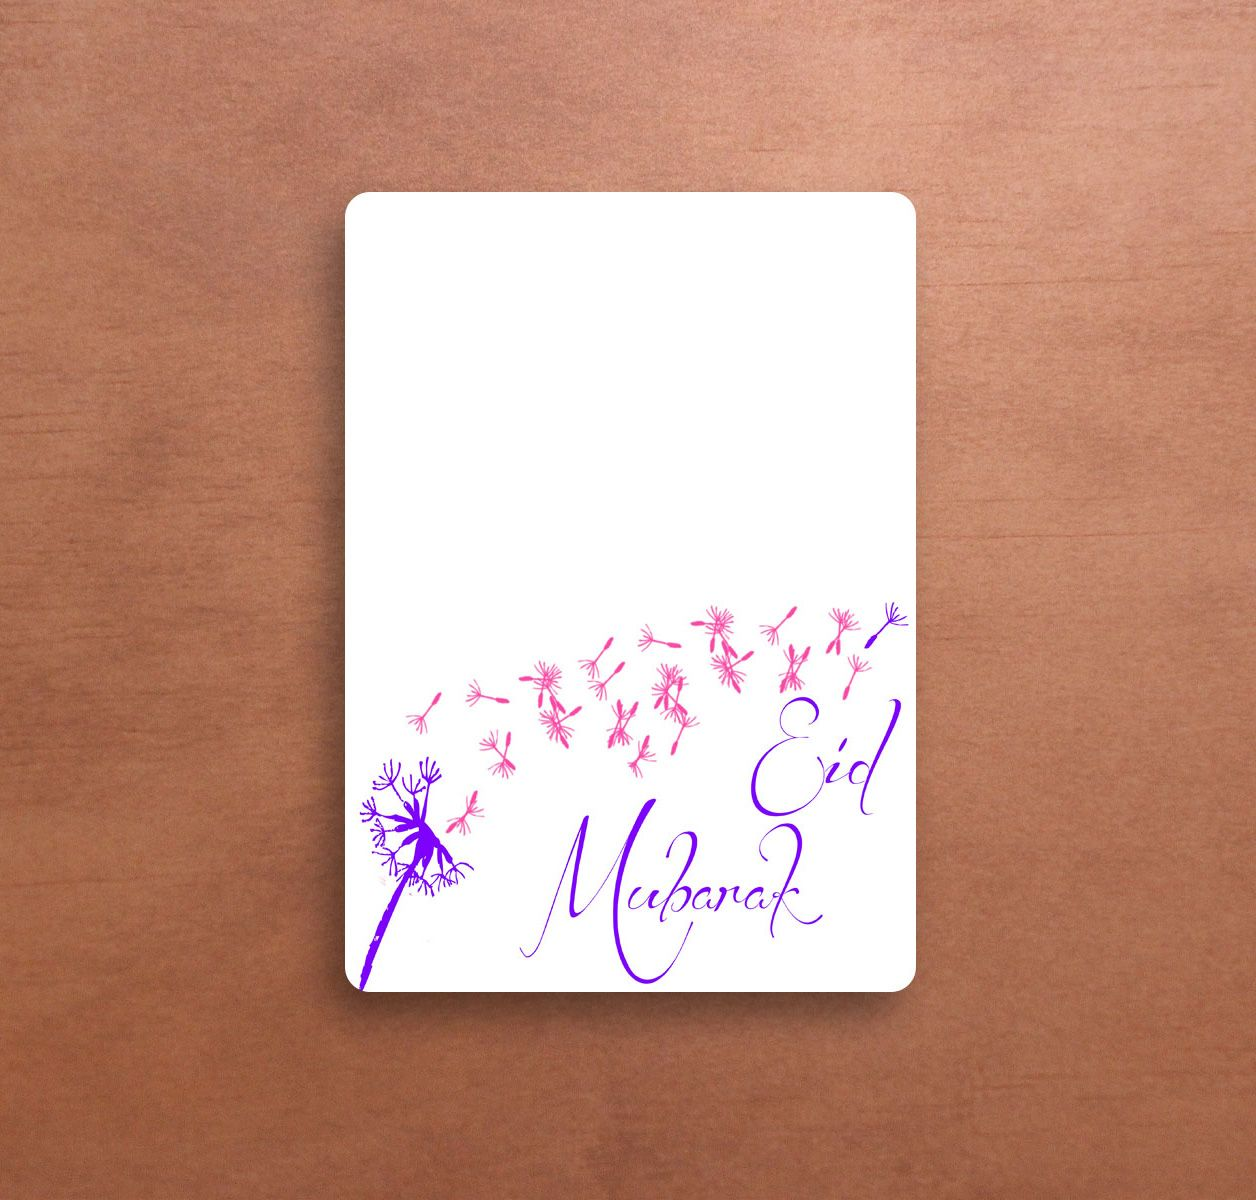 Free Eid Mubarak Greeting Card Printable Download Printable Greeting Cards Eid Mubarak Greeting Cards Eid Mubarak Greetings